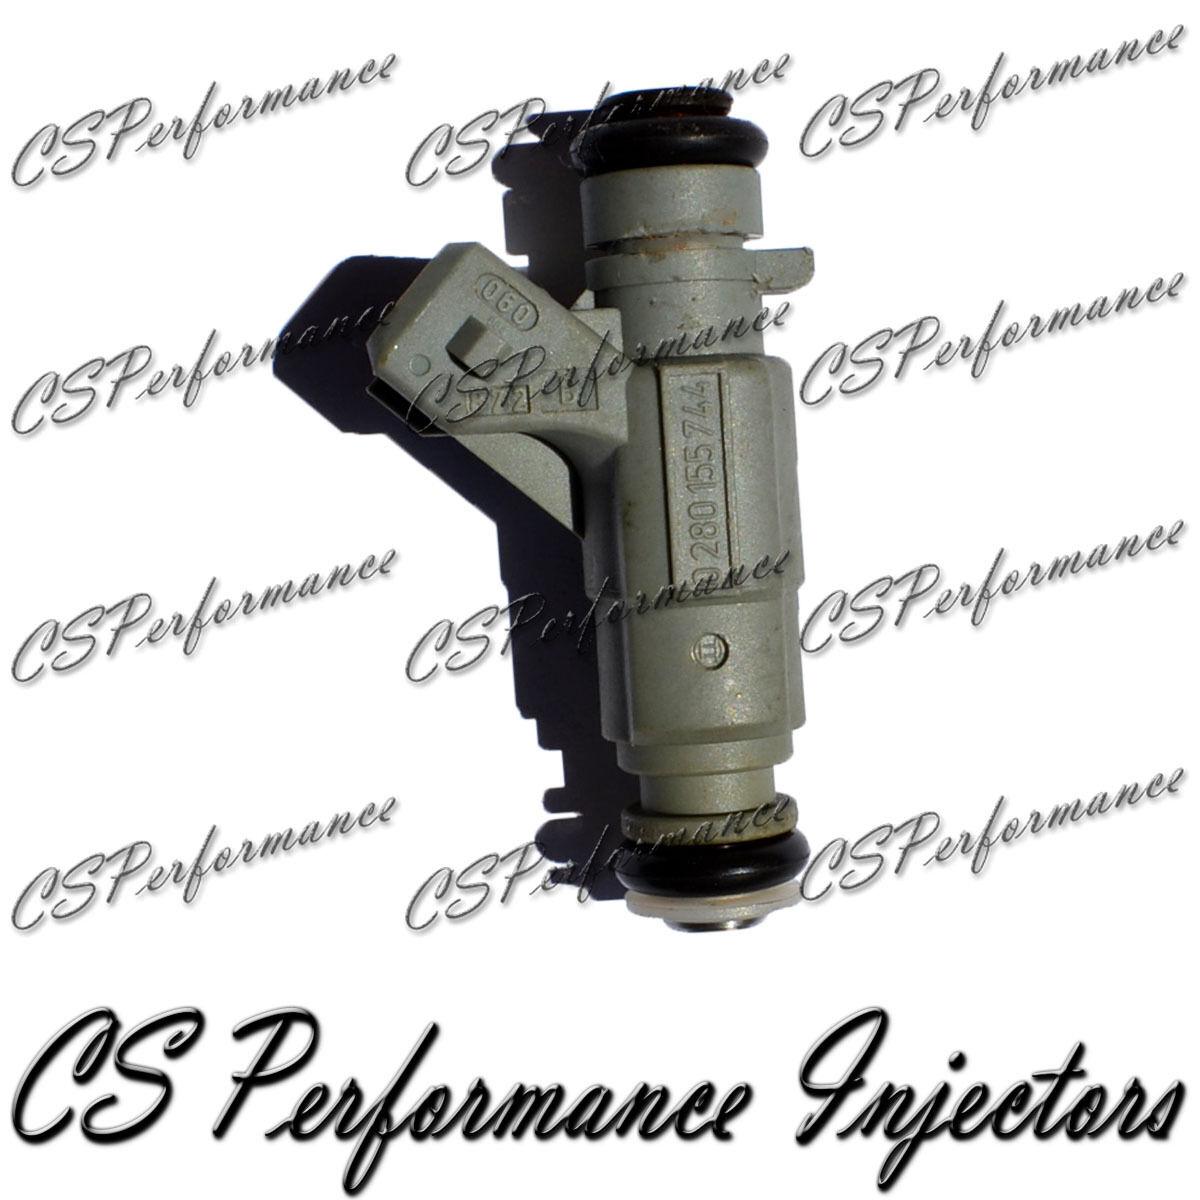 6 OEM Bosch Fuel Injectors Set 0280155744 Rebuilt by Master ASE Mechanic USA